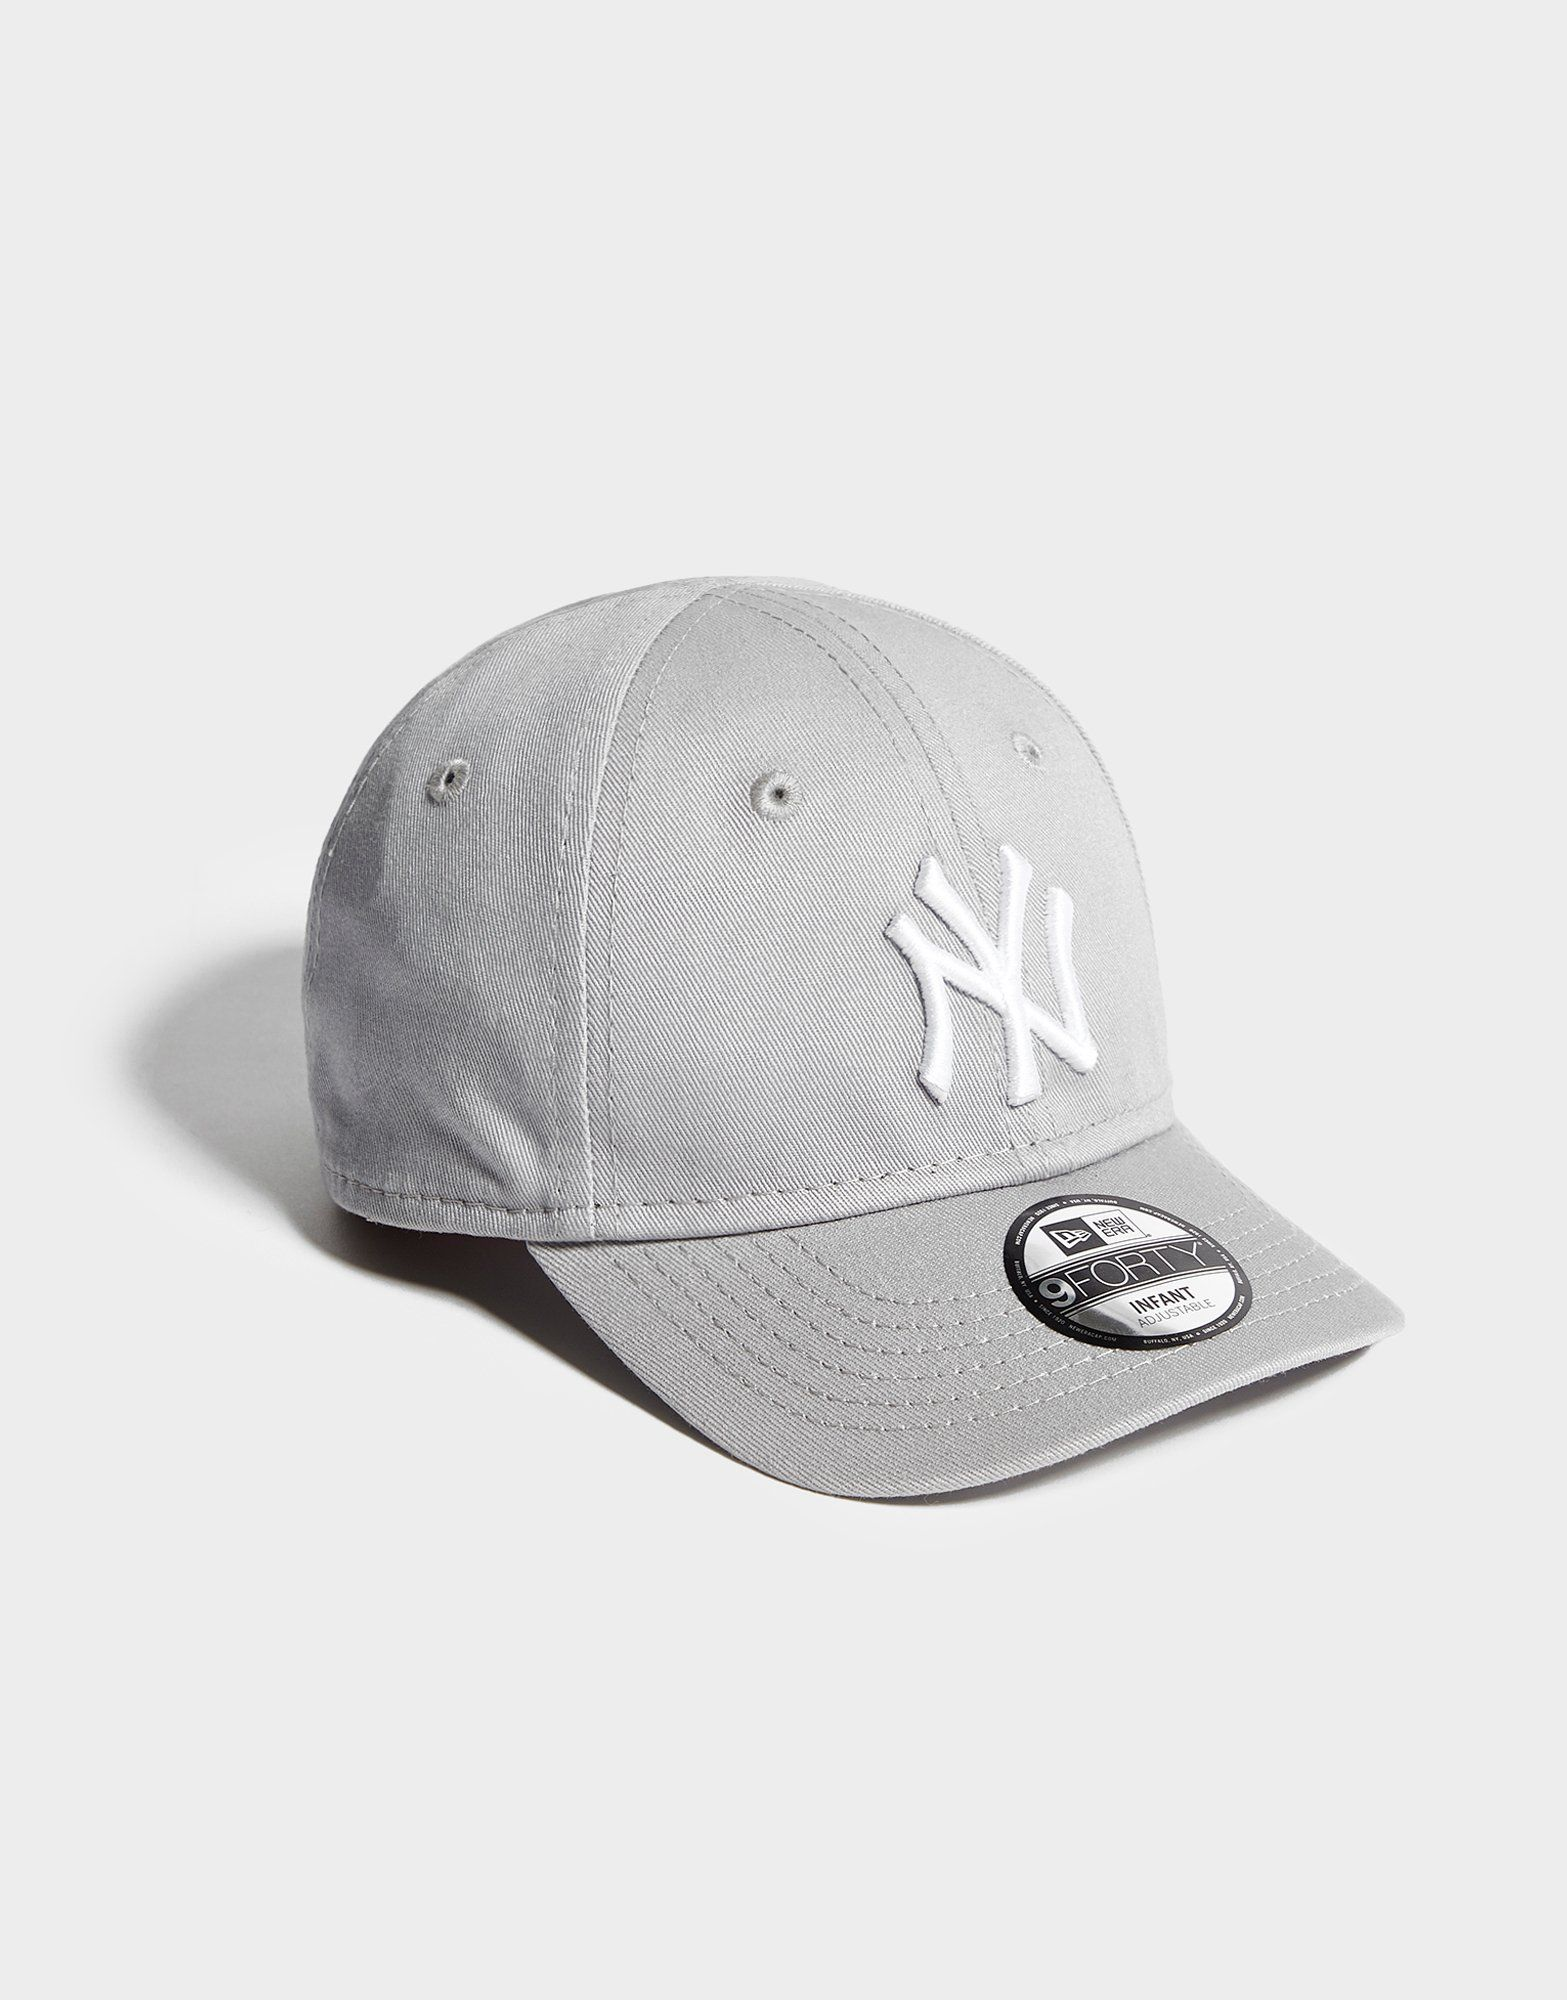 New Era MLB New York Yankees 9FORTY Cap Infant  ffafcf80fcaa